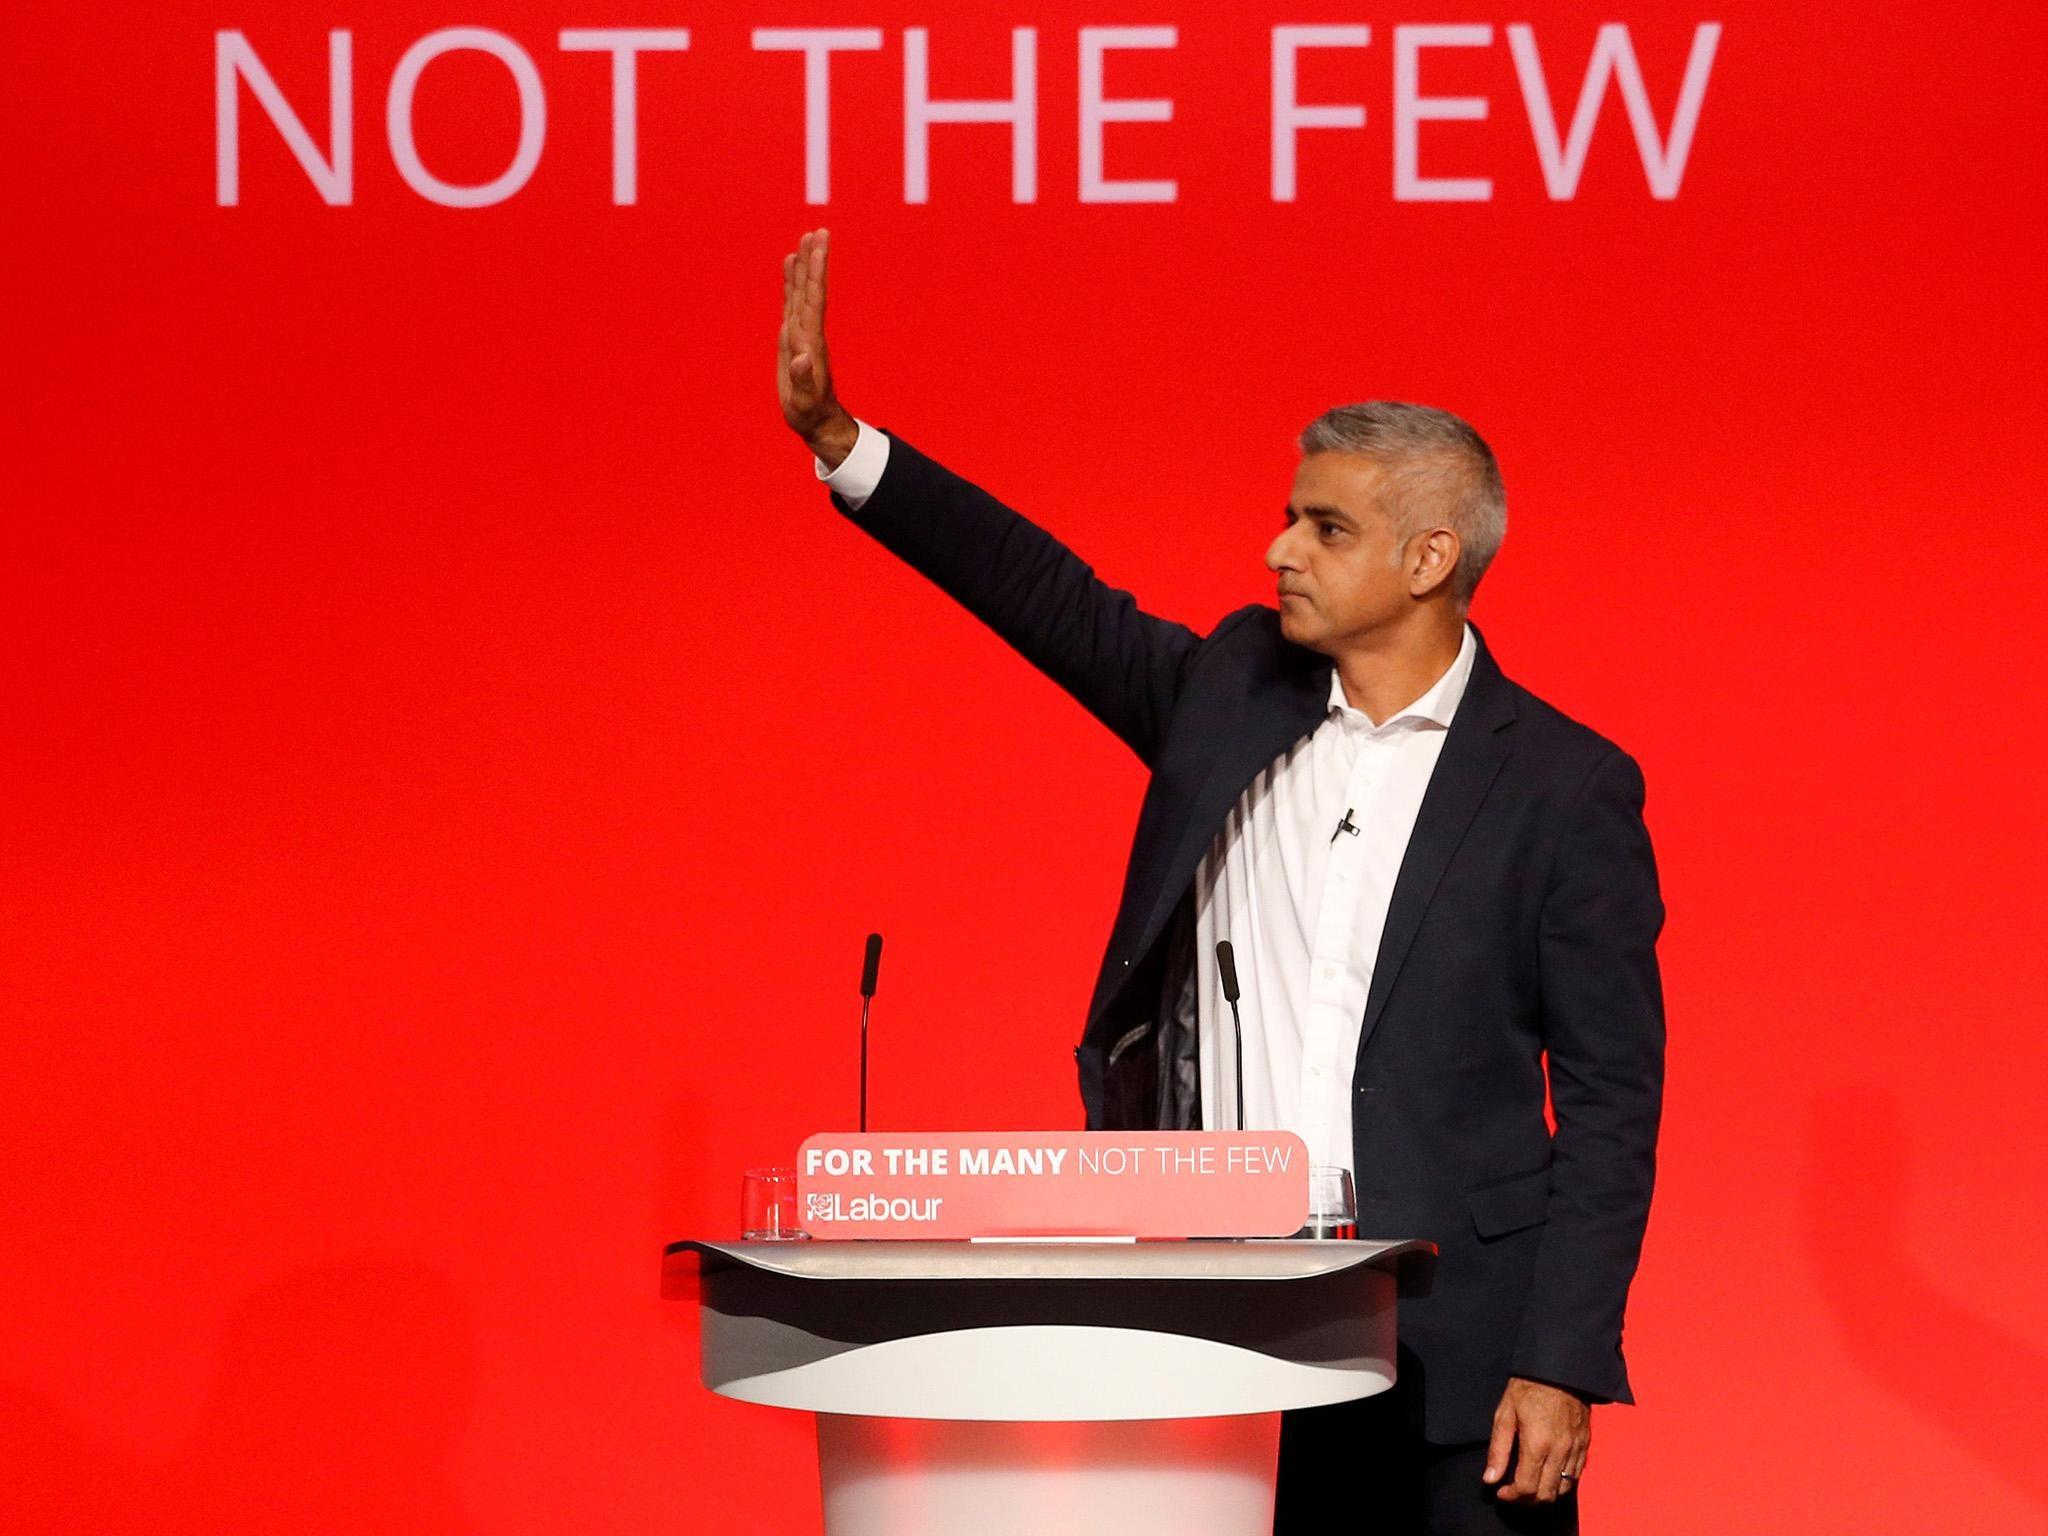 Sadiq Khan suggests Labour may back second referendum on Brexit